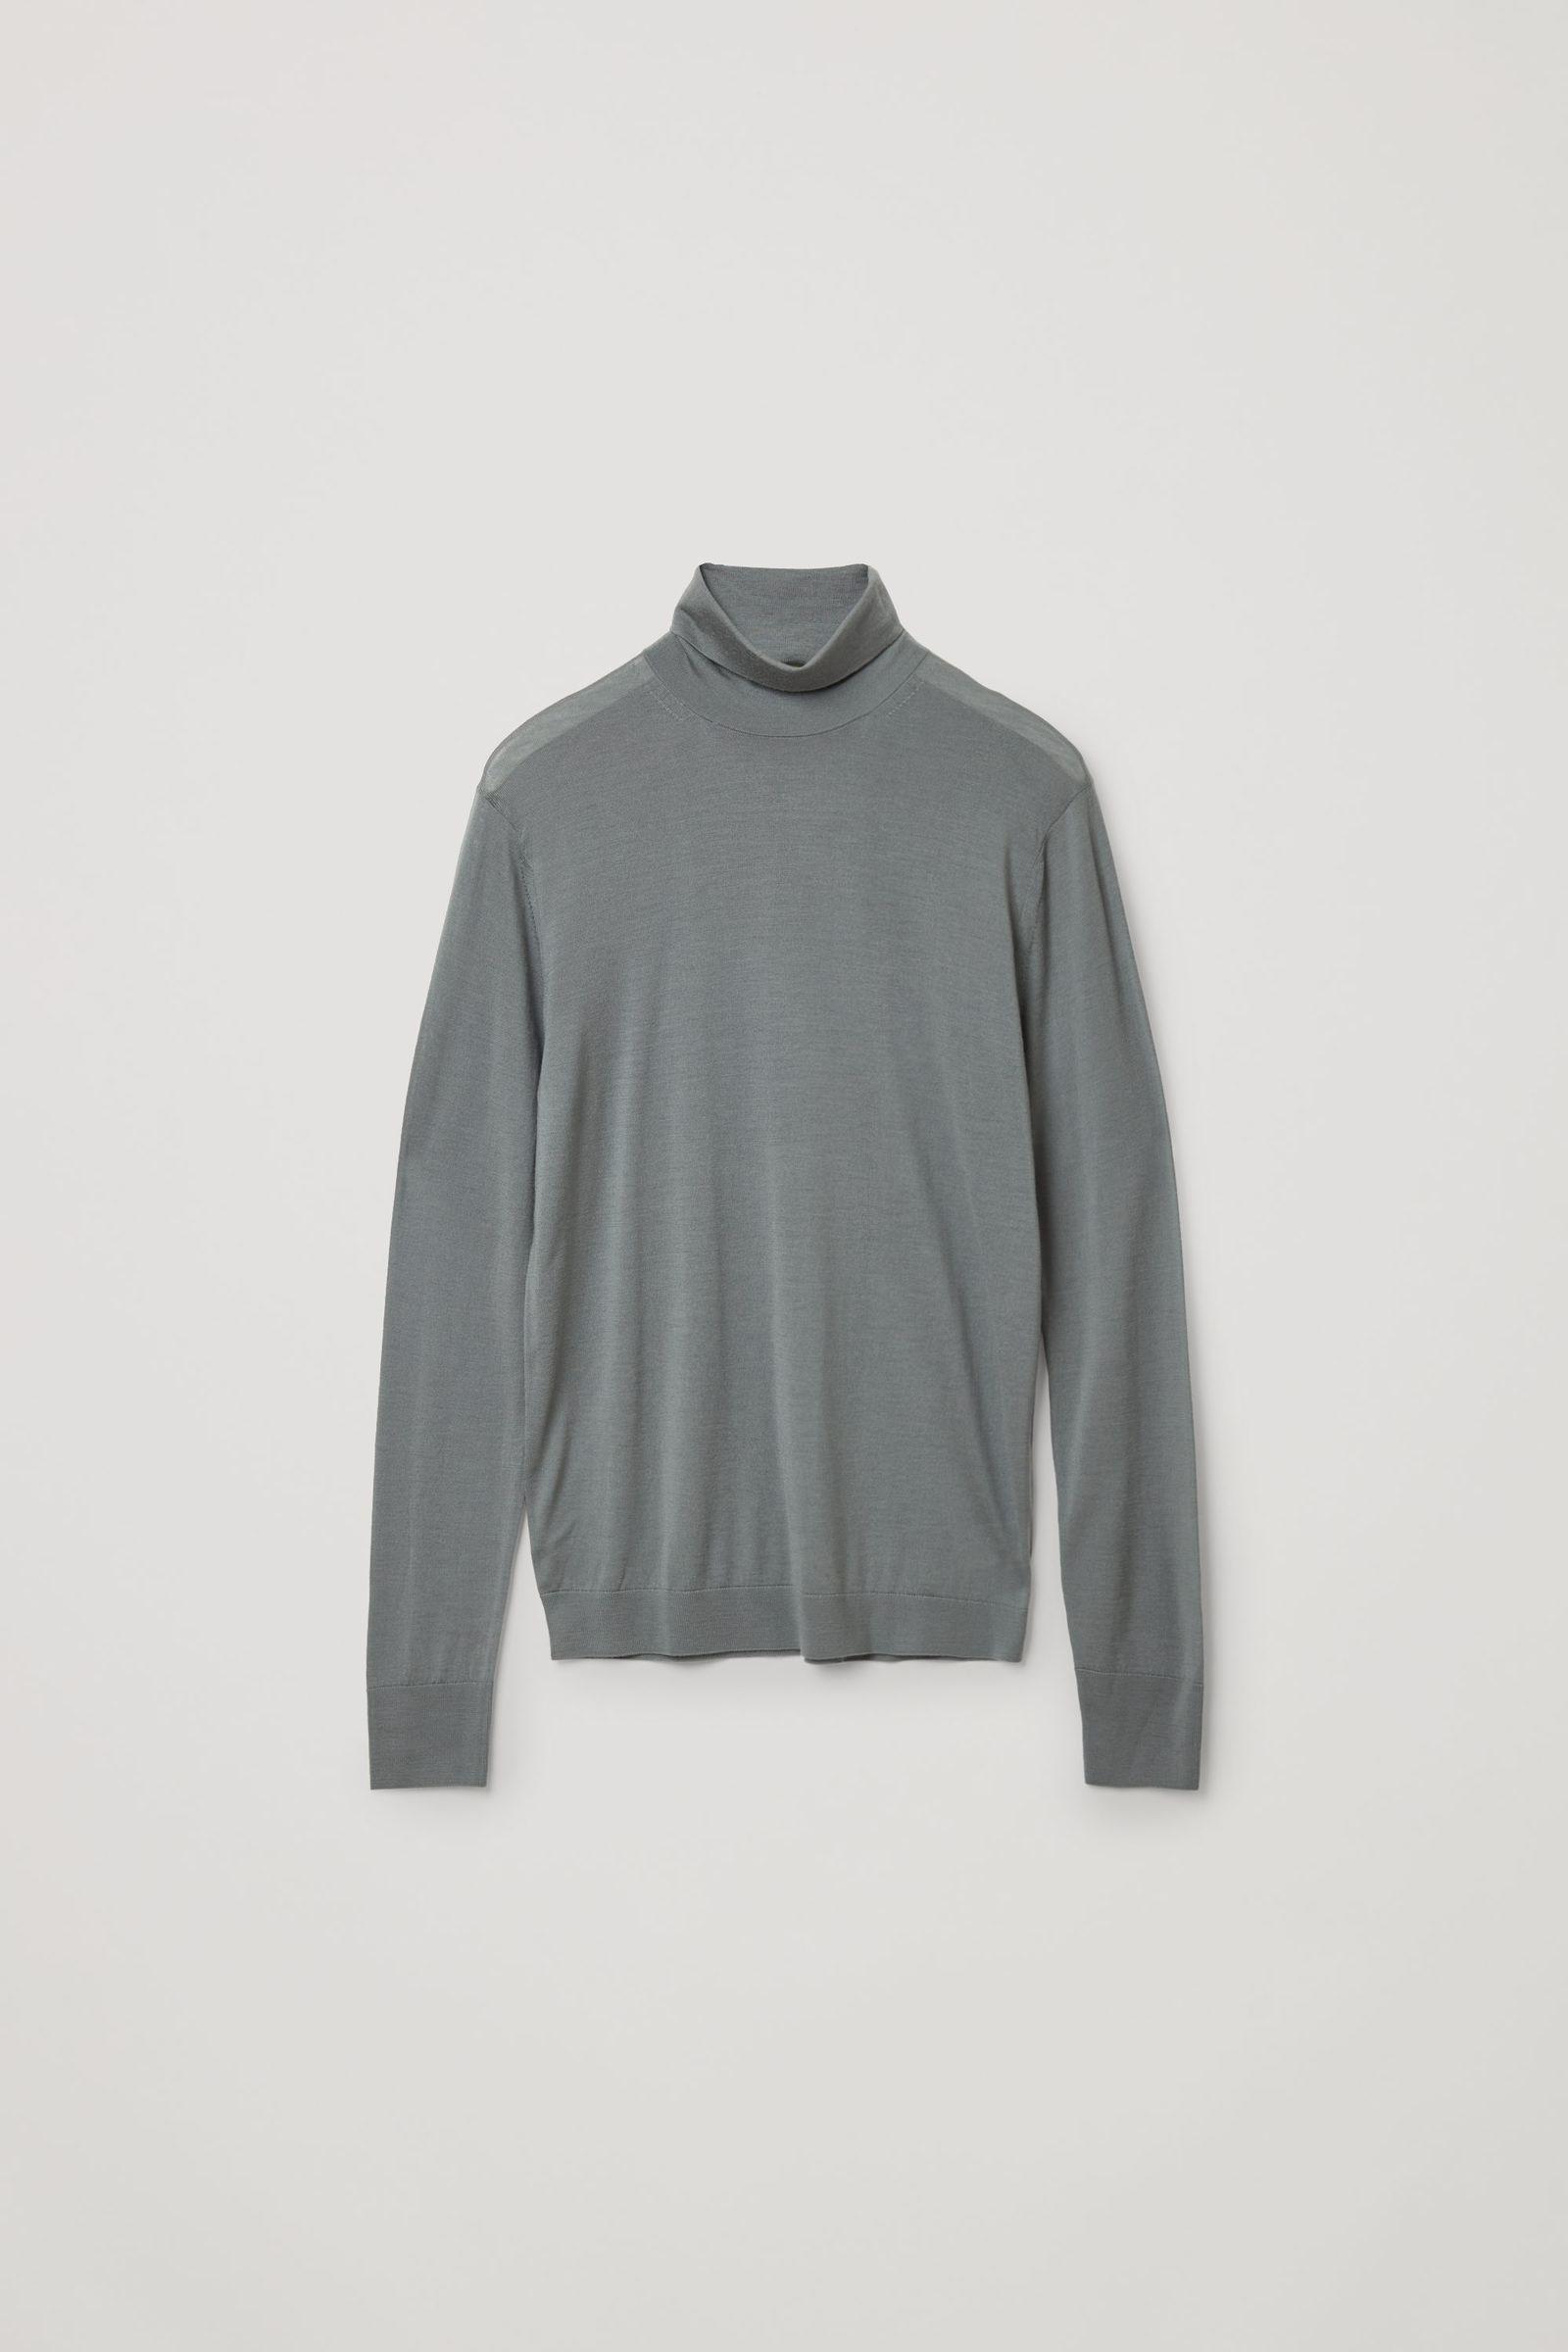 COS 메리노 롤넥 스웨터의 그레이컬러 Product입니다.